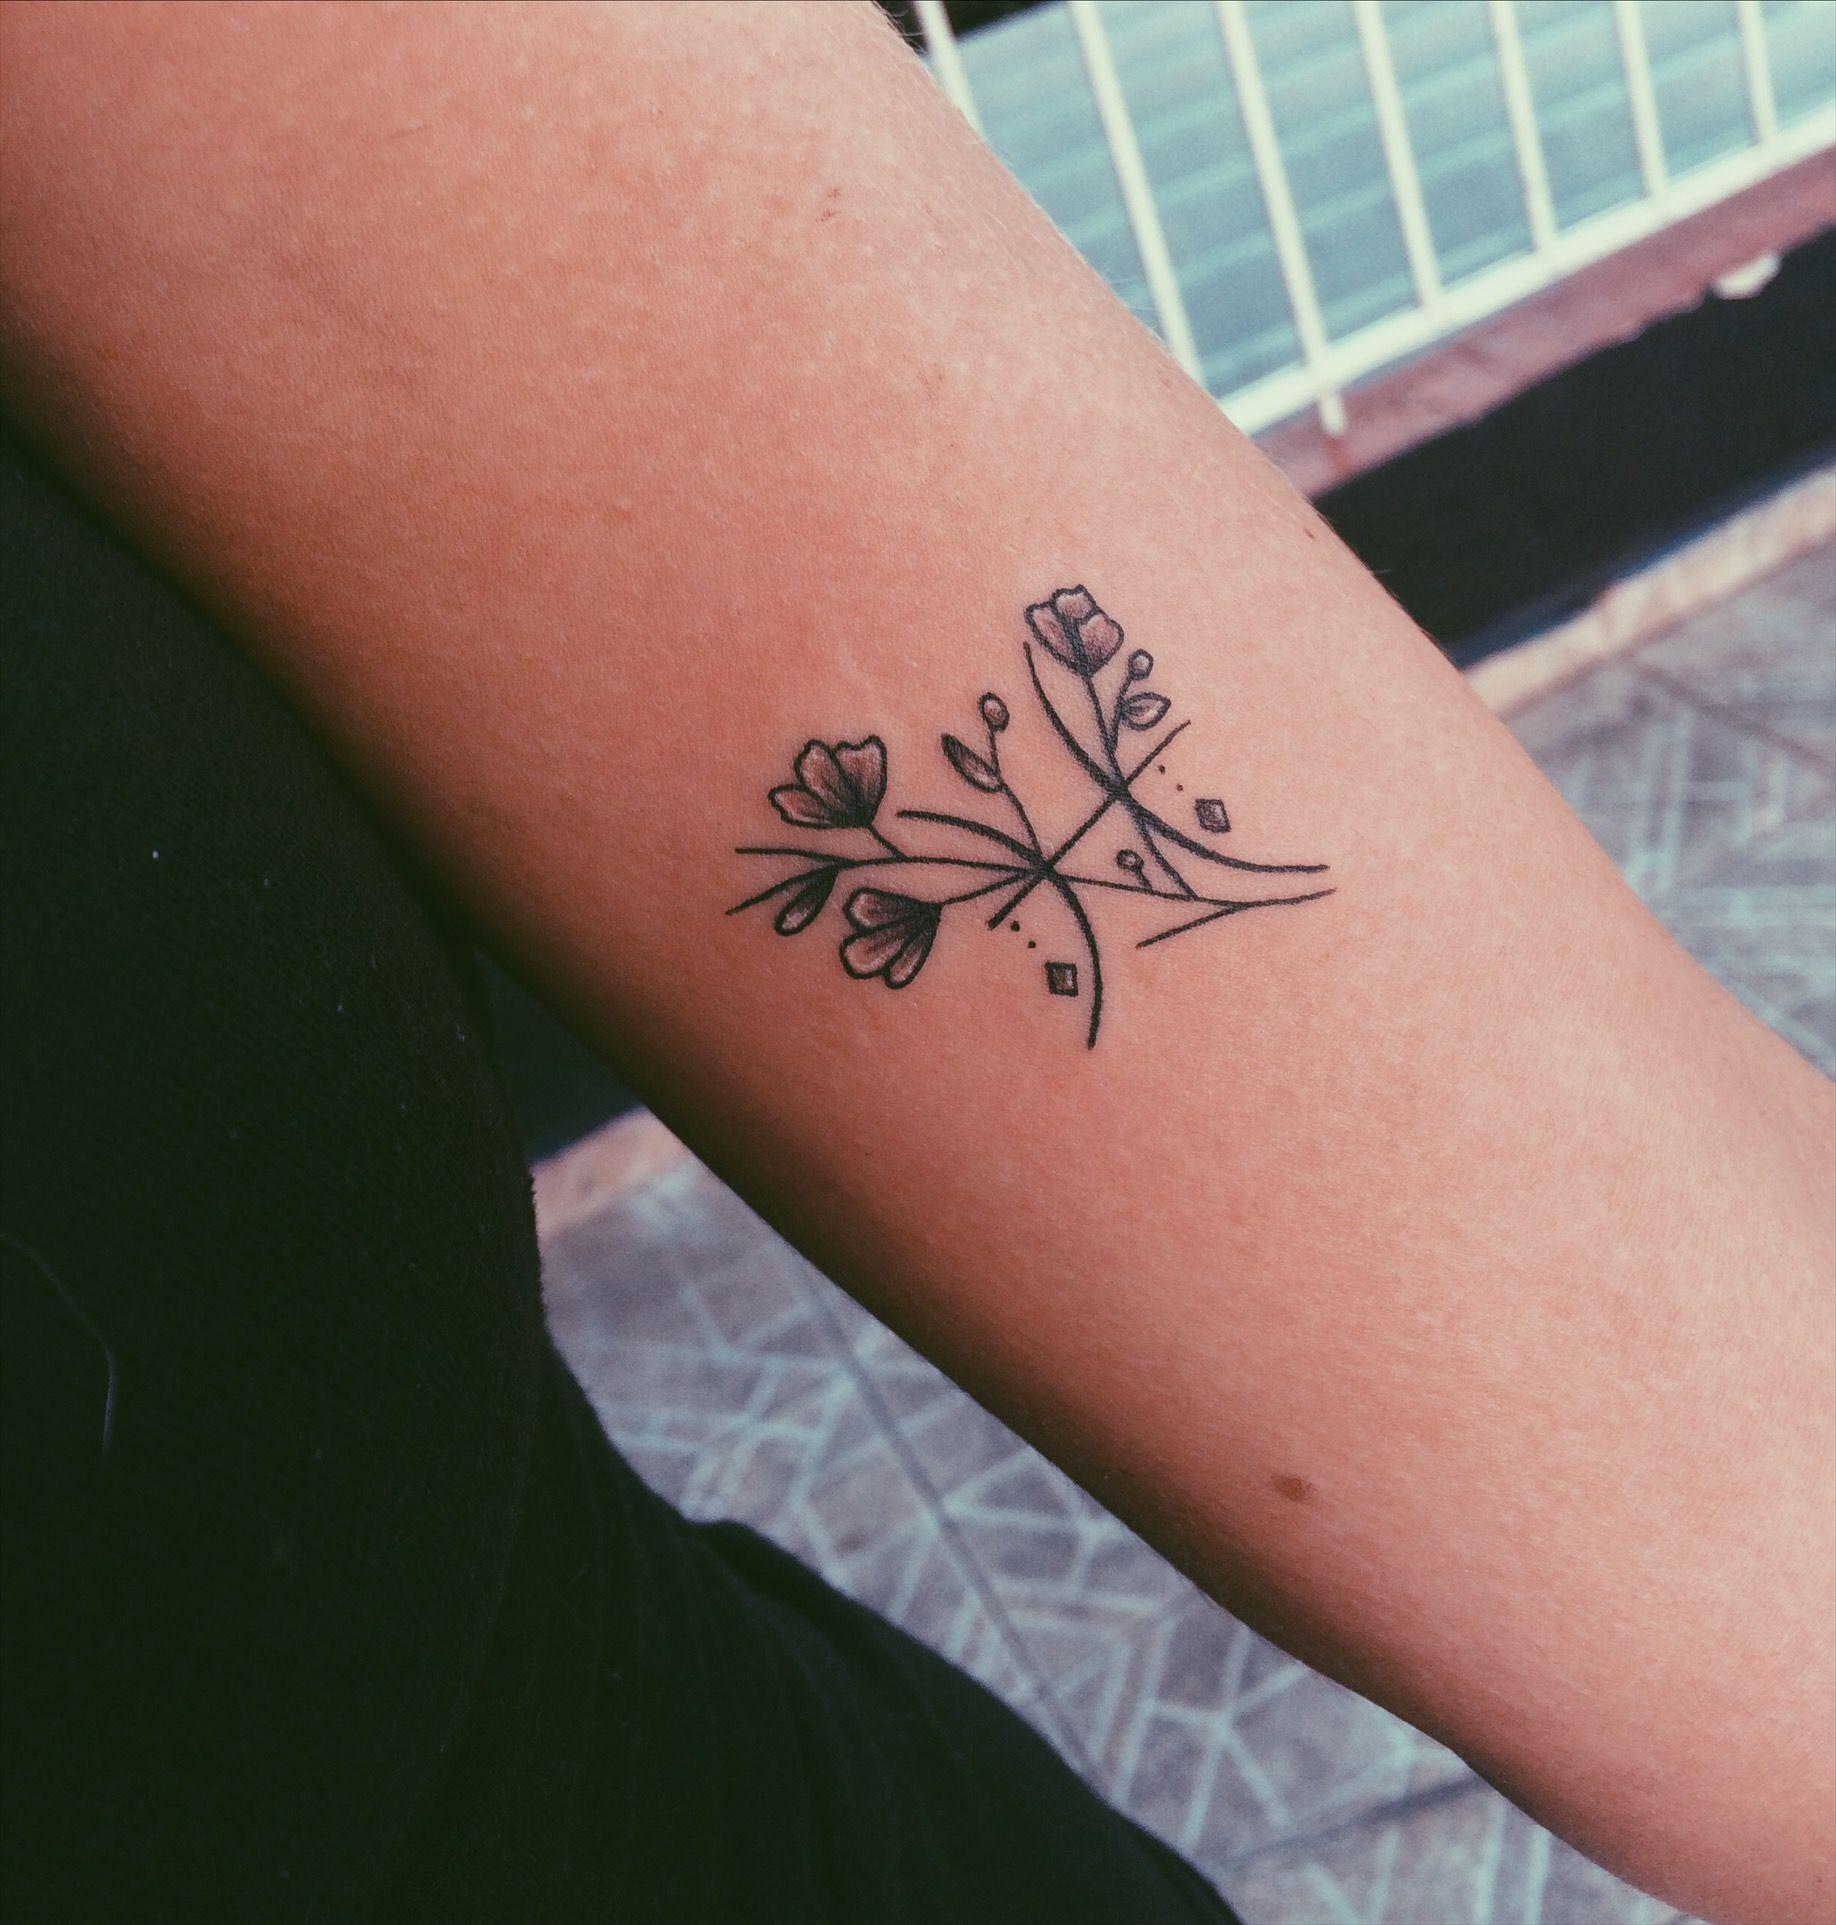 Pisces Tattoo Pisces Tattoos Horoscope Tattoos Pisces Tattoo Designs